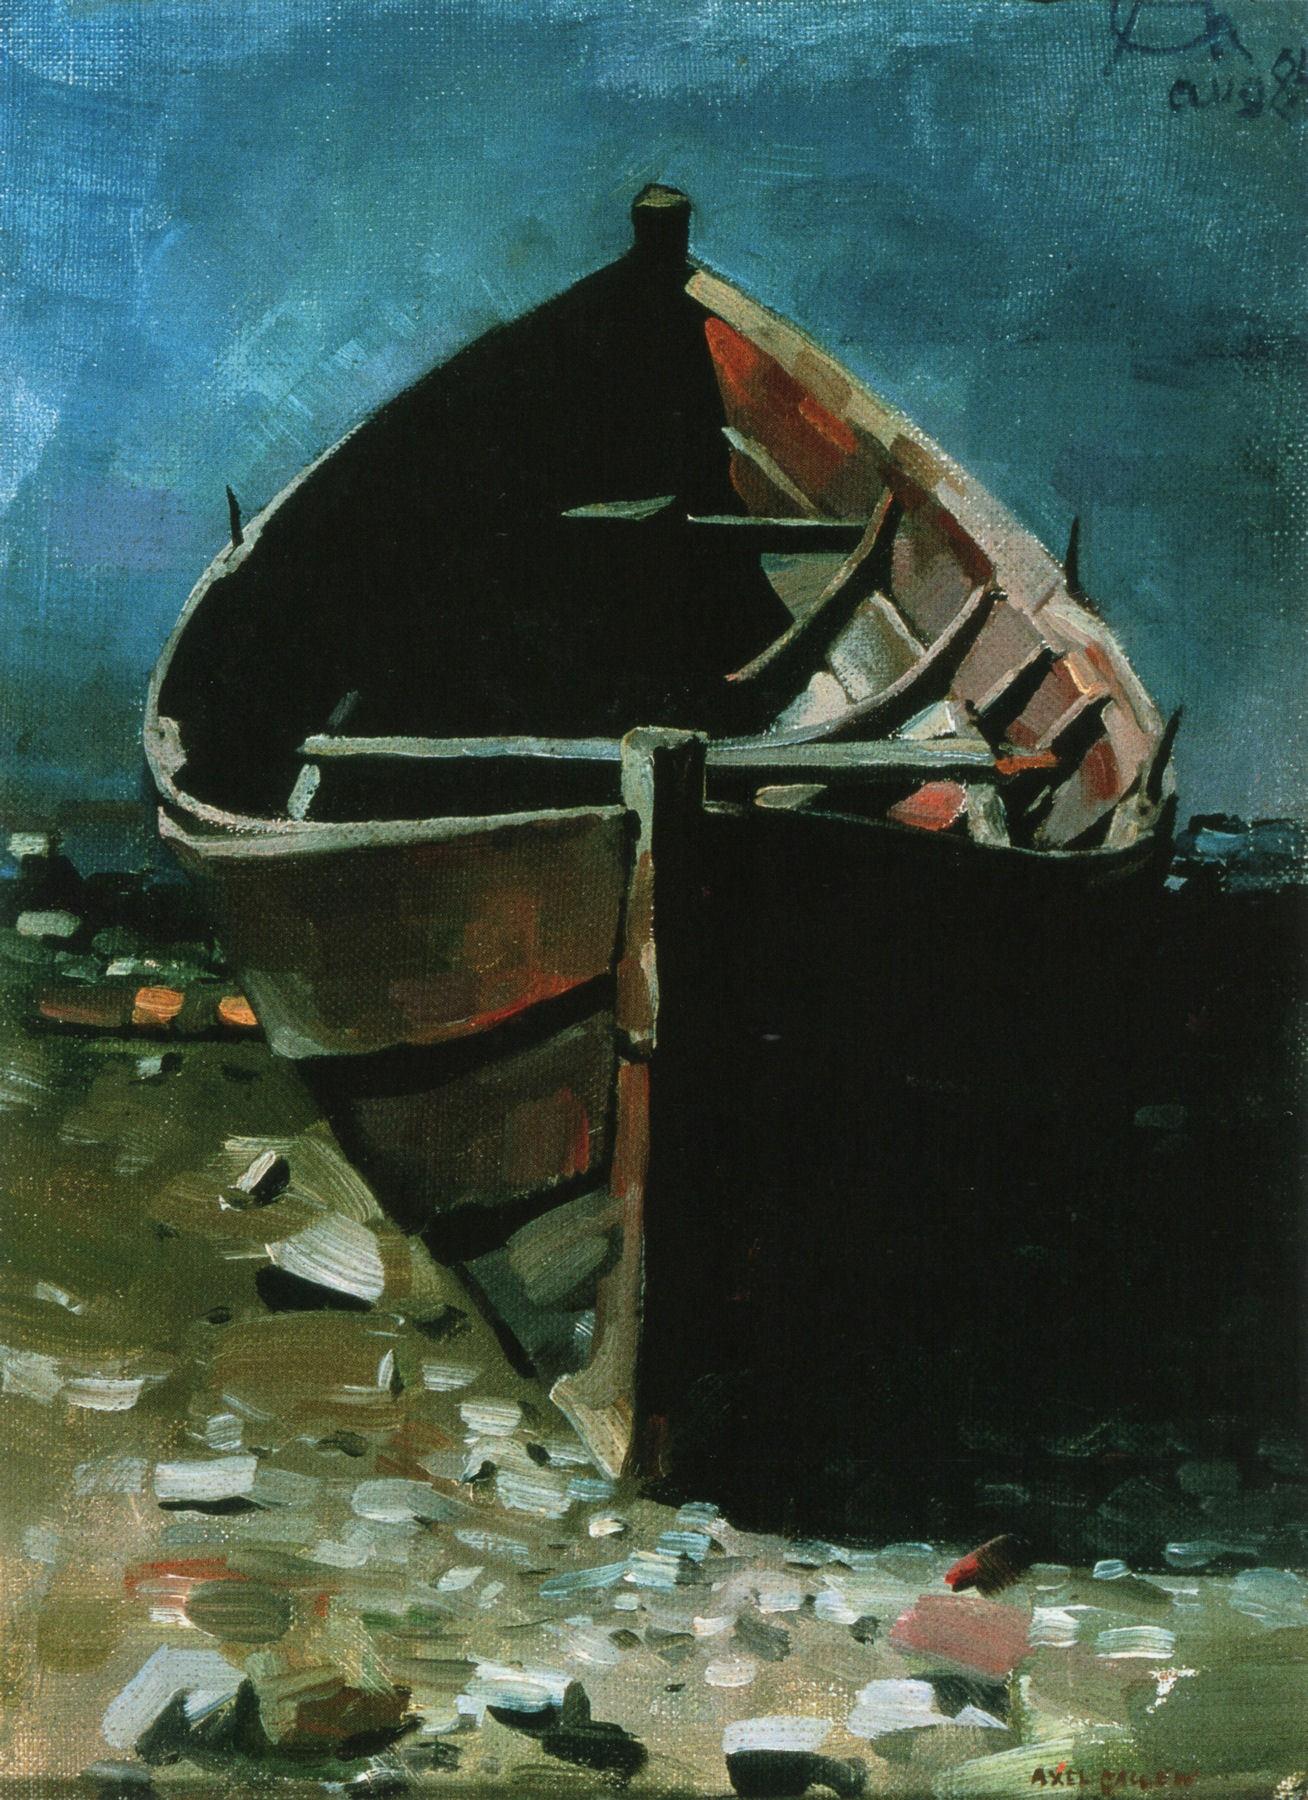 Beached Boat at Daybreak, Akseli Gallen-Kallela - 1884